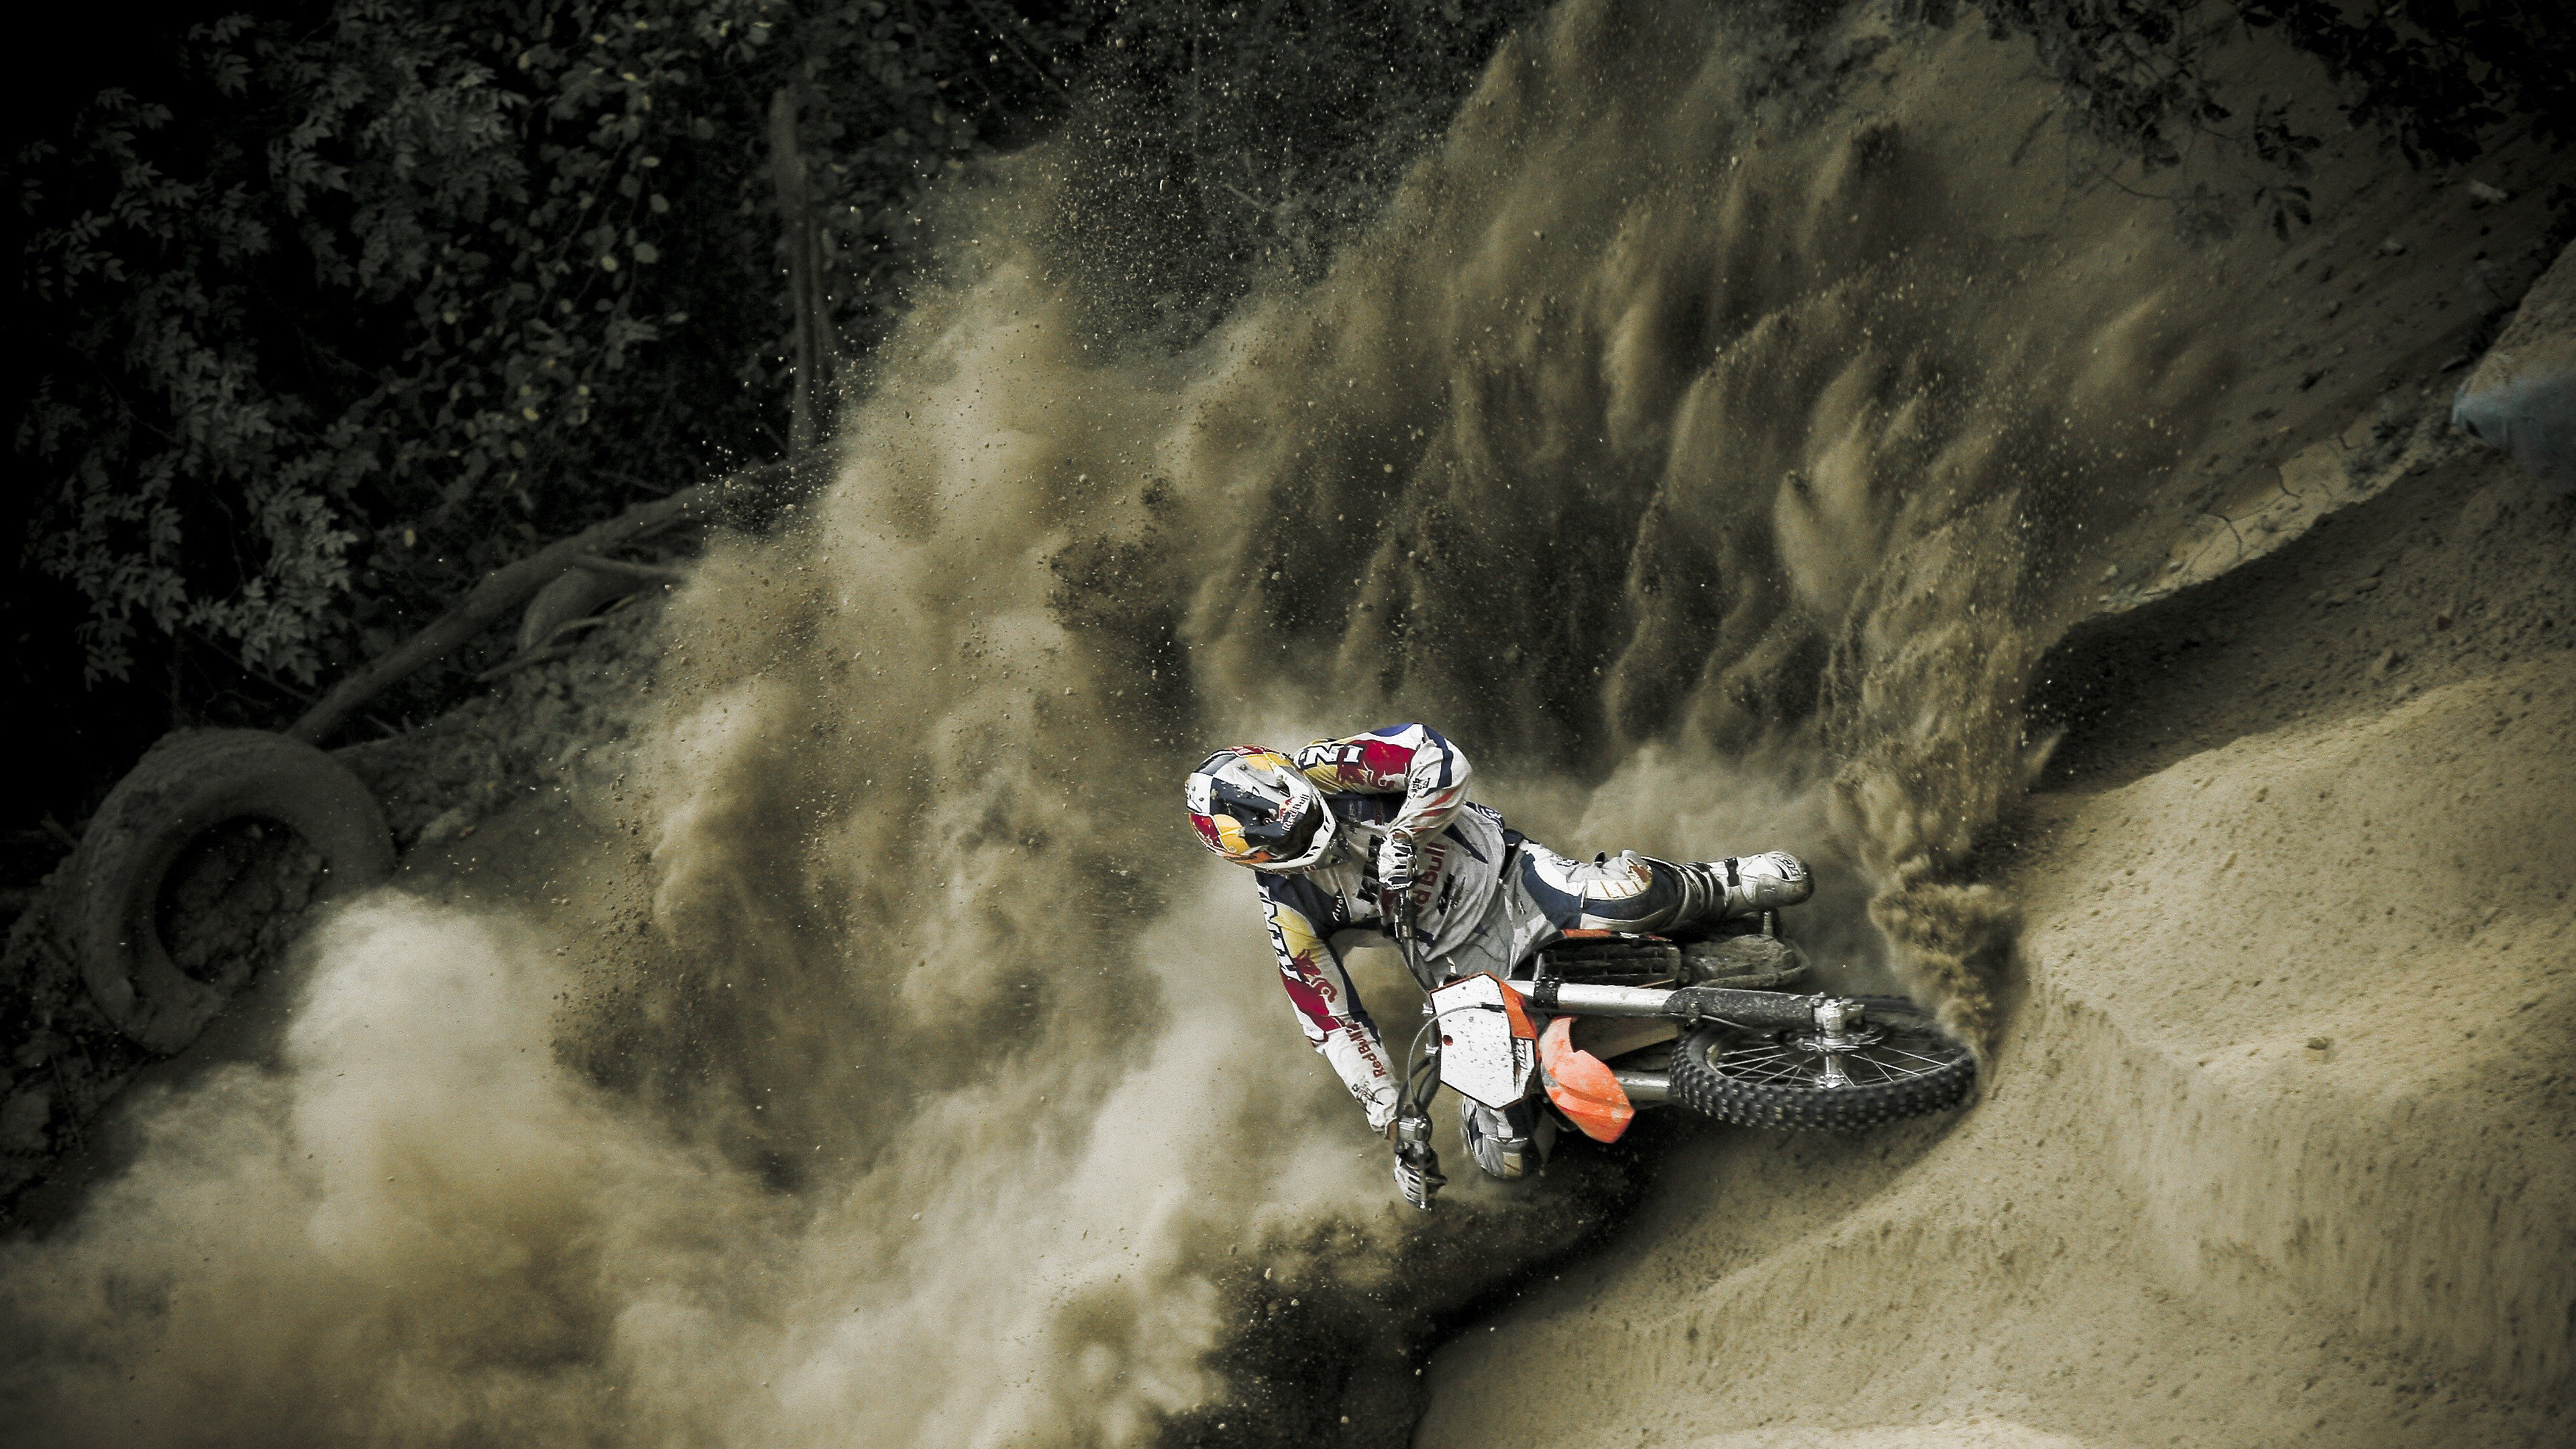 Dirt Bike Wallpaper HD 48690